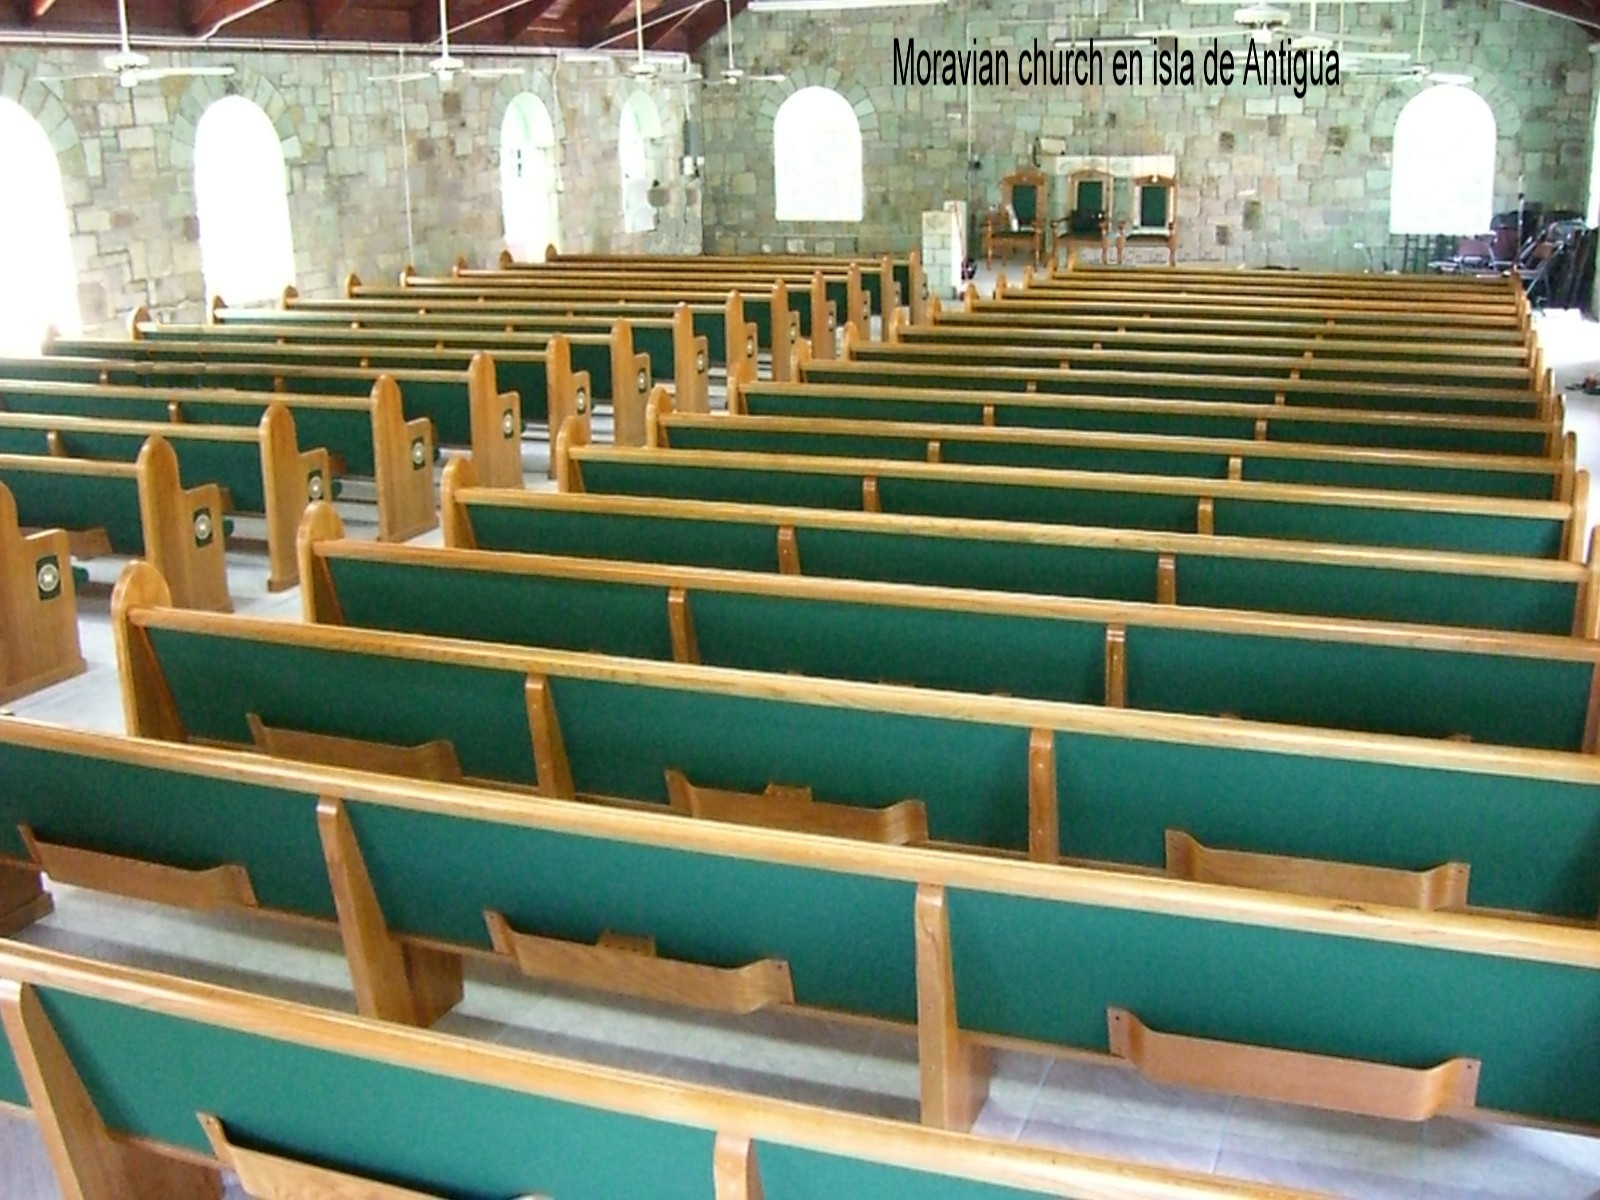 Moravian Church Antigua W.I.